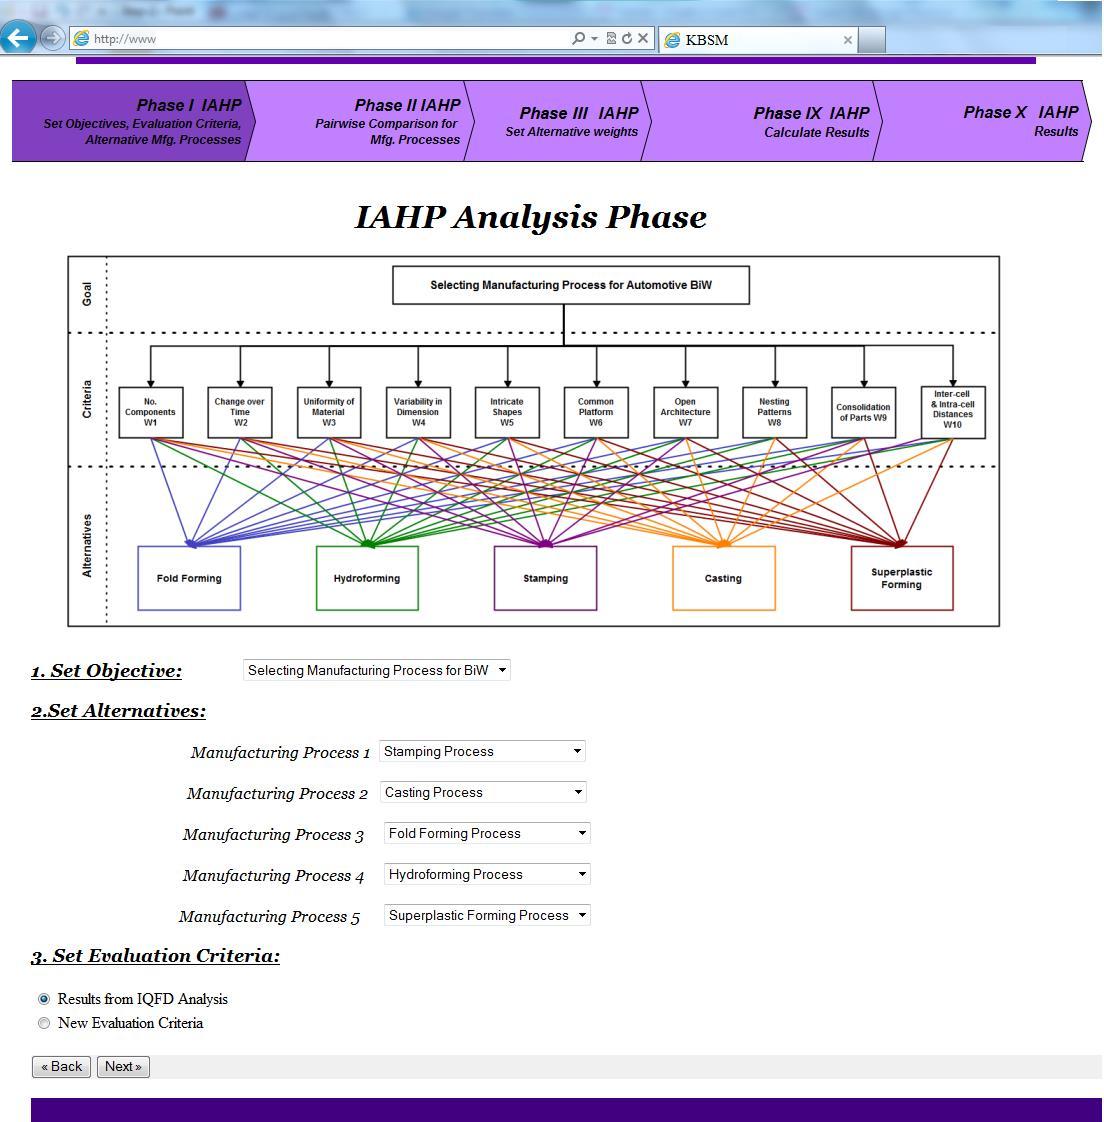 IAHP Analysis